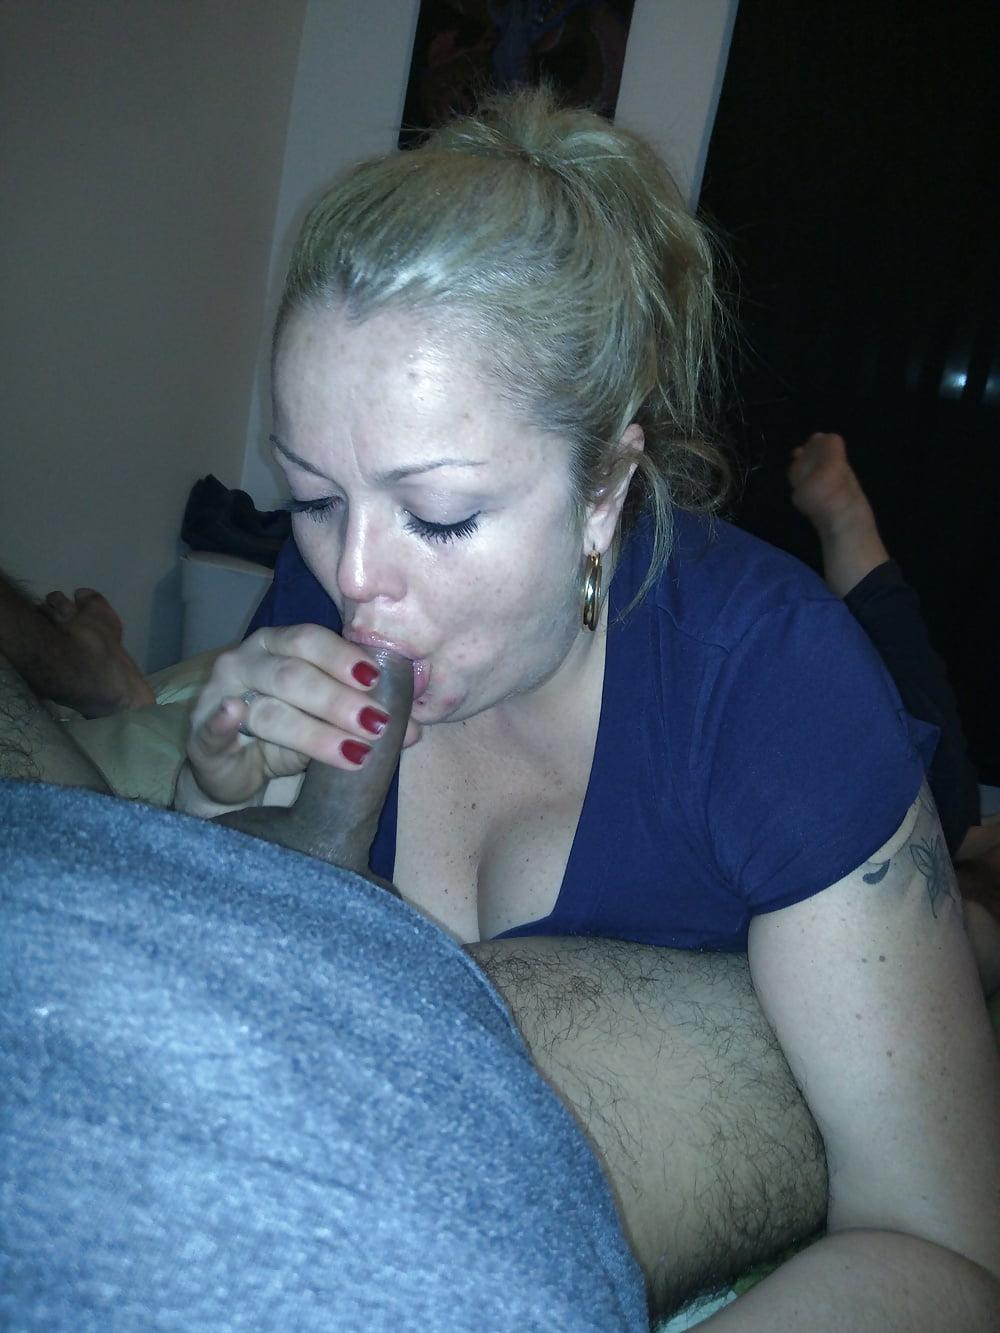 Mexicana enmascarada cogida en el sillon del sexo - 3 6